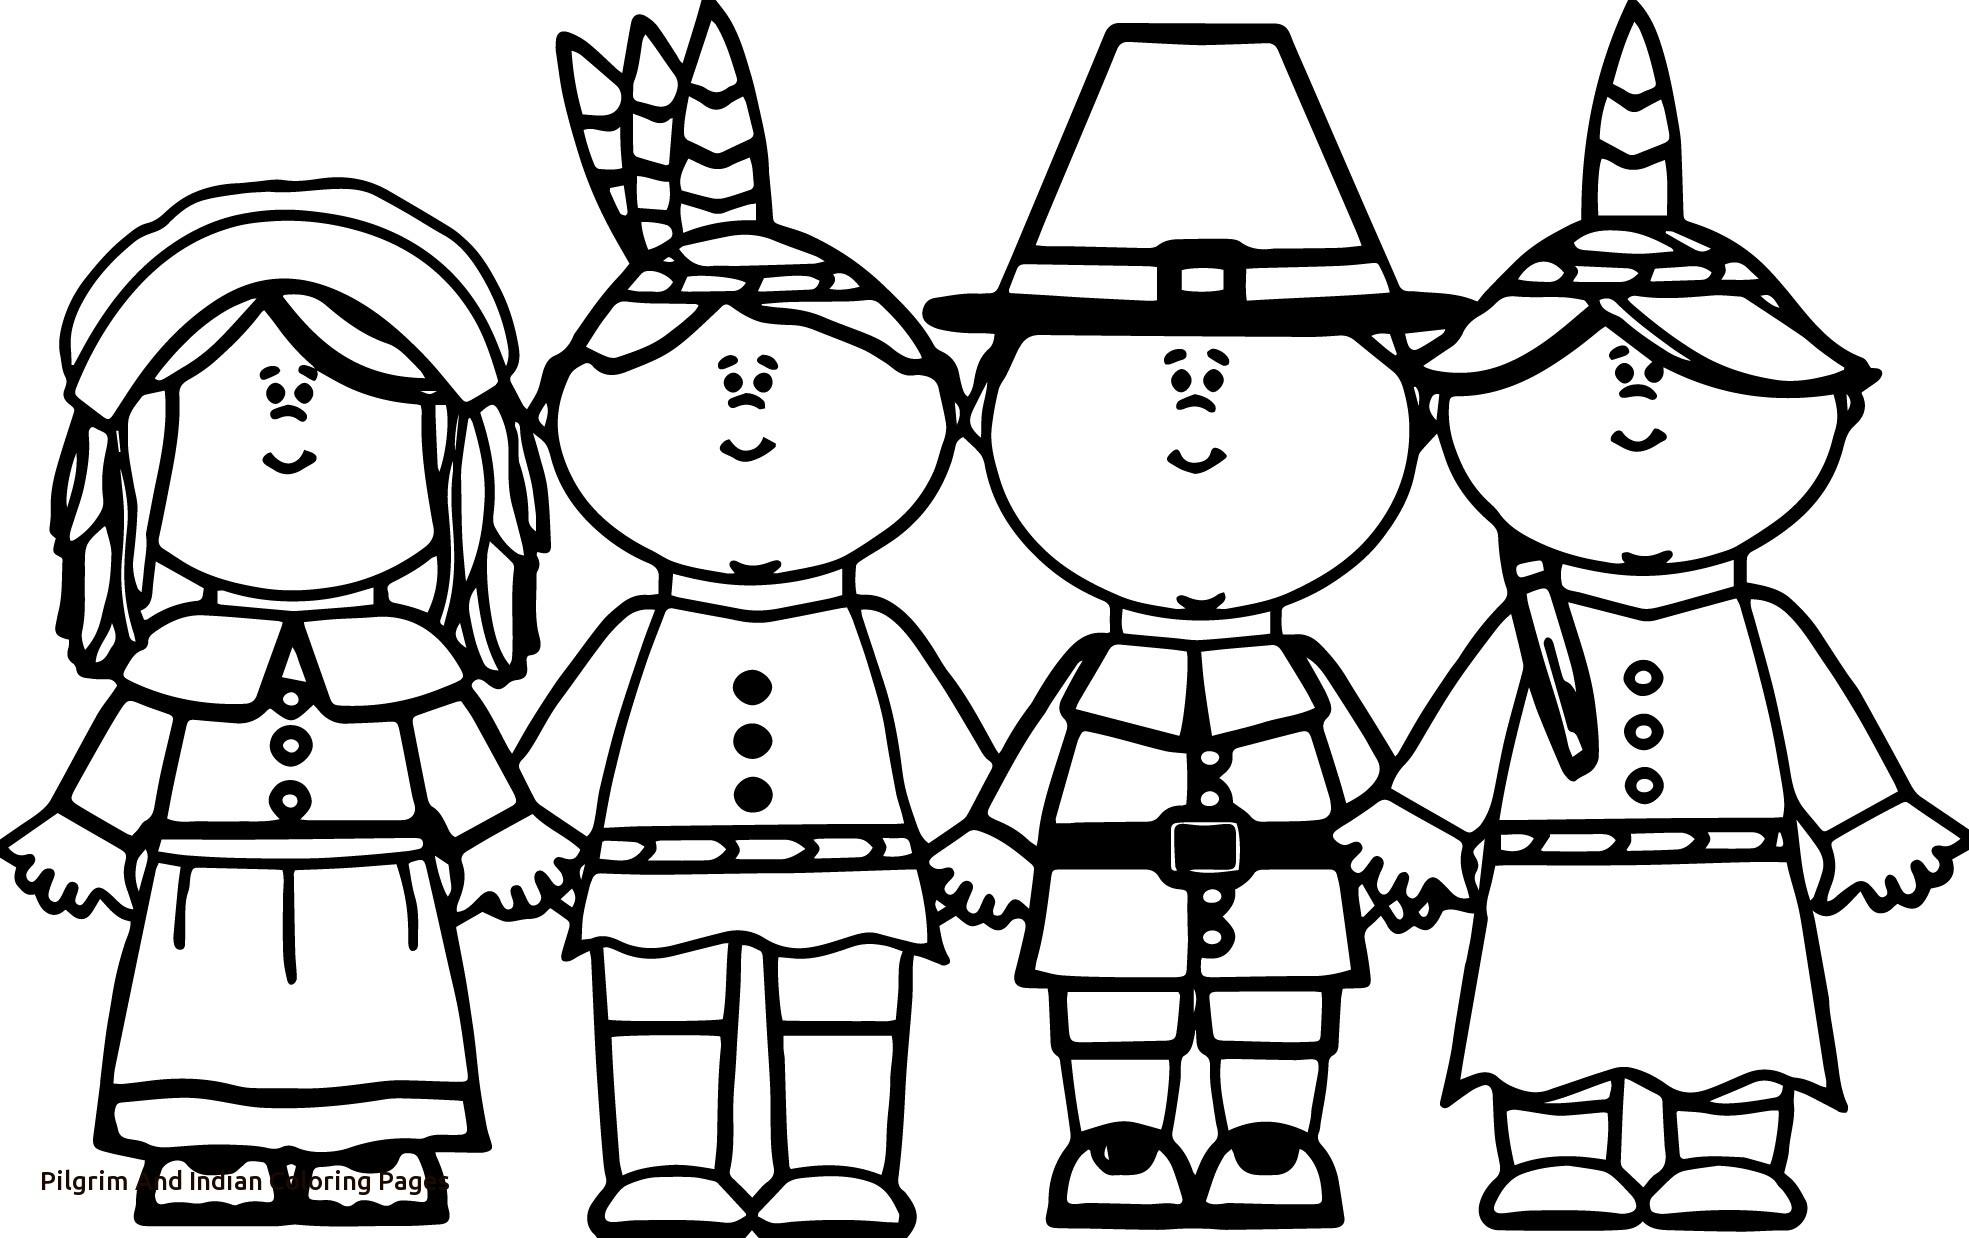 Native American Cartoon Drawing At Getdrawings